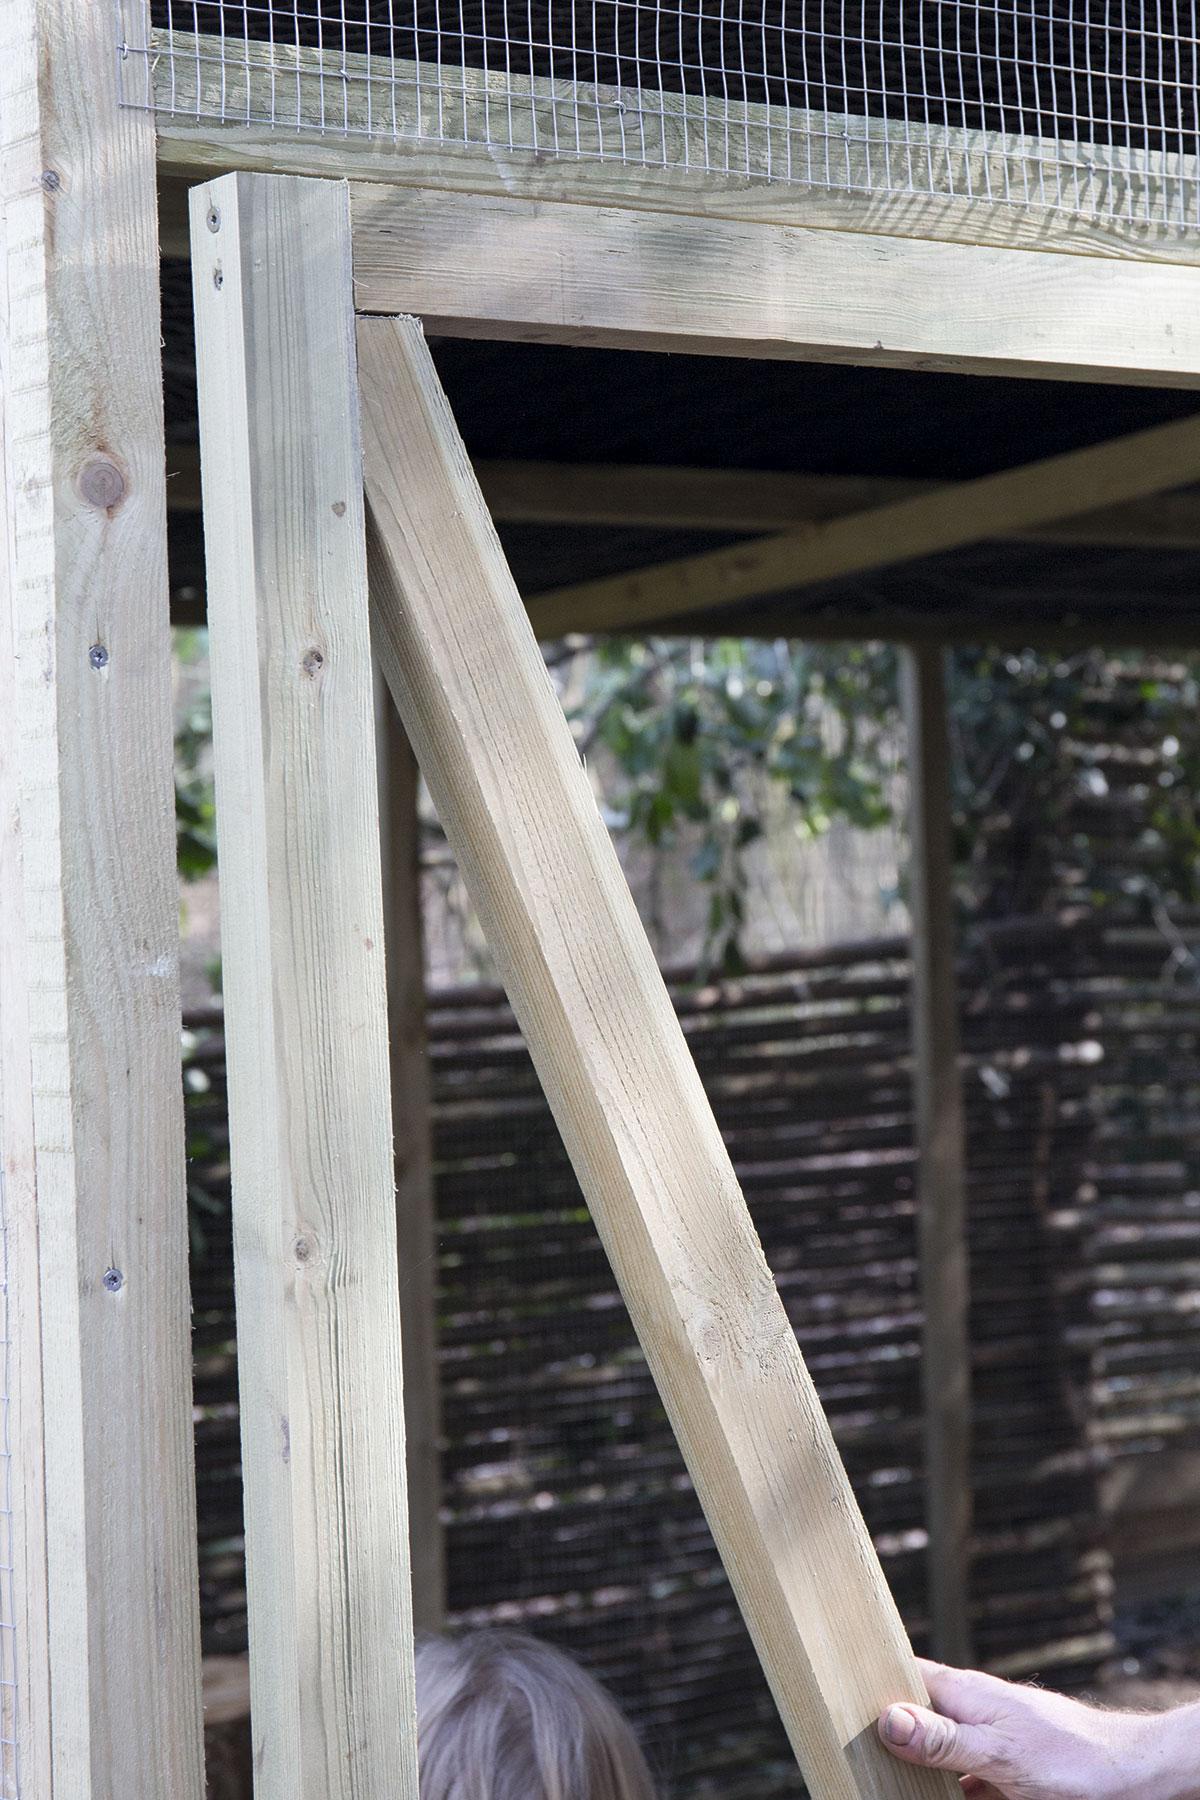 Døren monteres til hønsegården